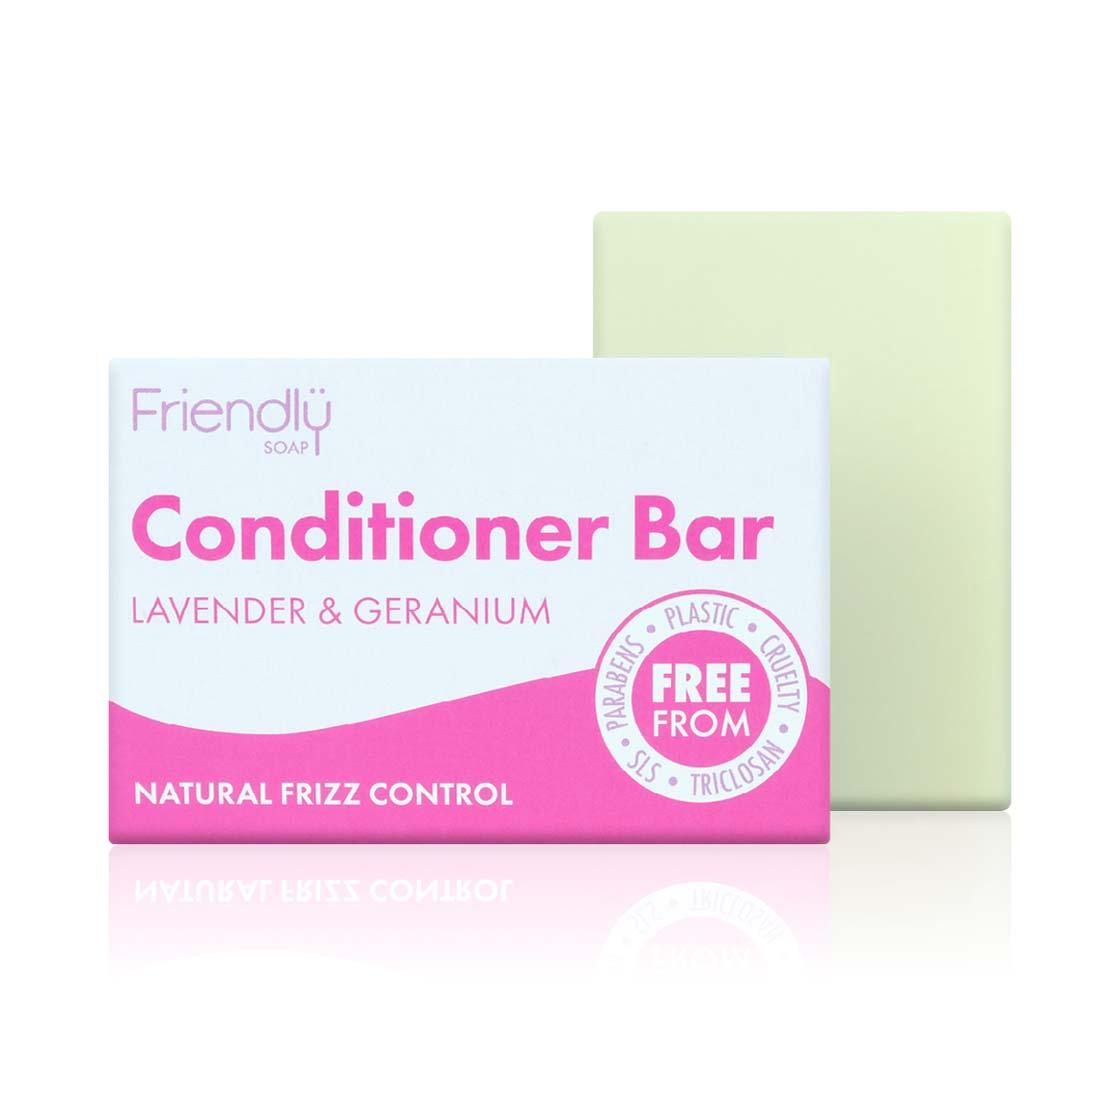 Conditioner Bar (90g) - Lavender & Geranium by Friendly Soap